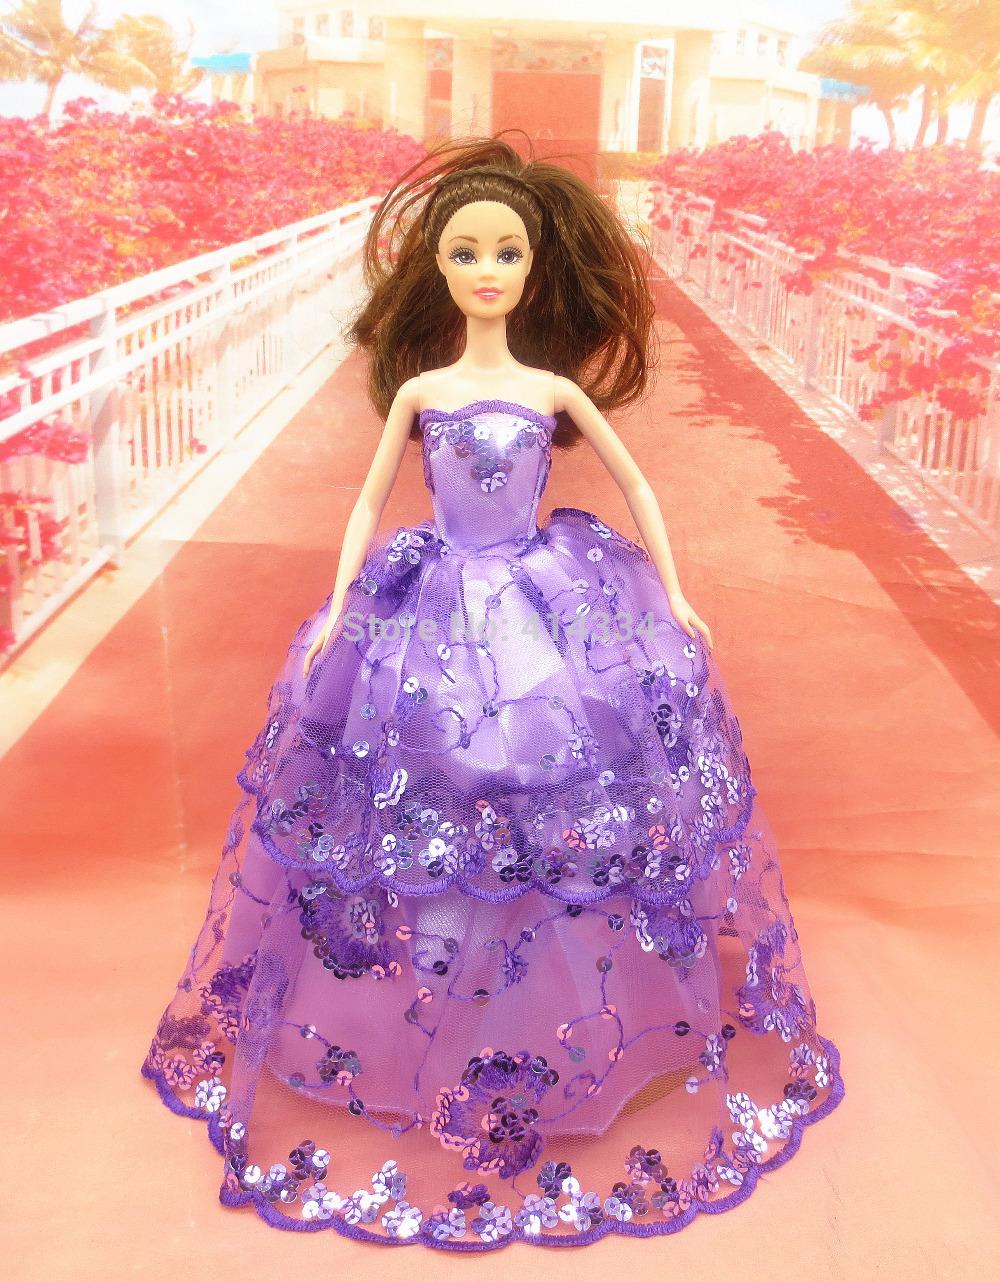 barbie hot images